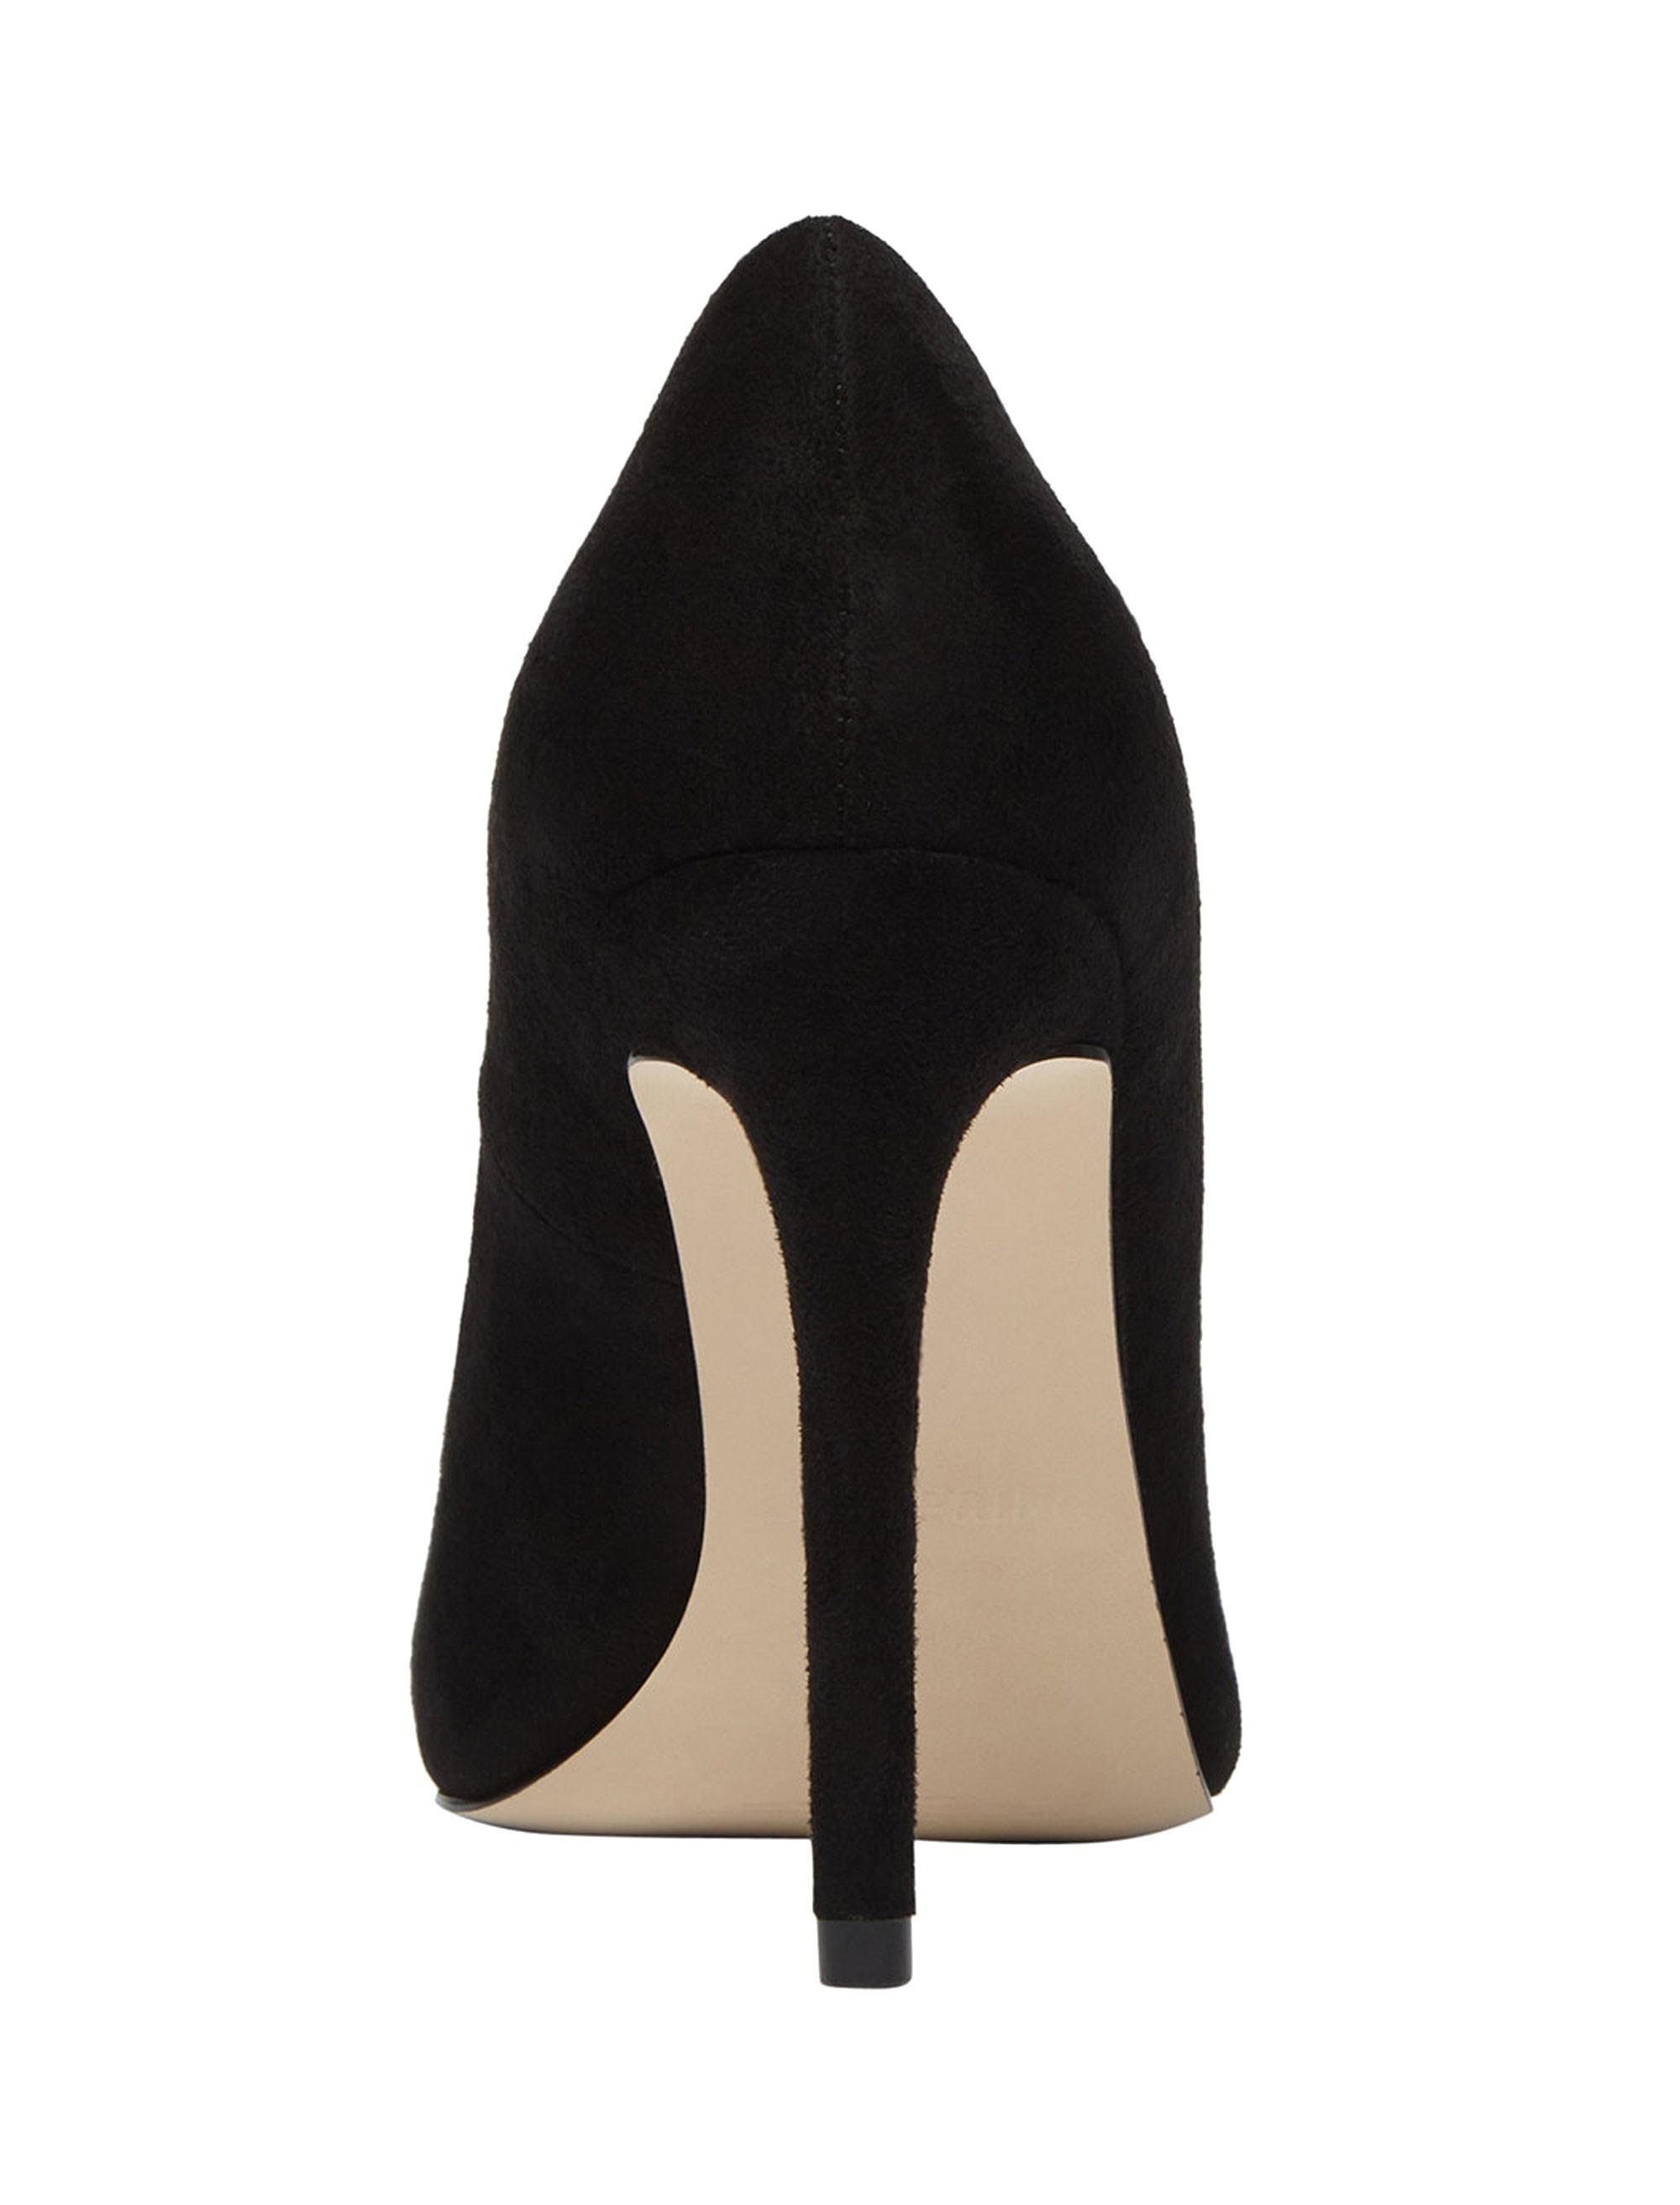 کفش پاشنه بلند زنانه - کال ایت اسپرینگ -  - 3